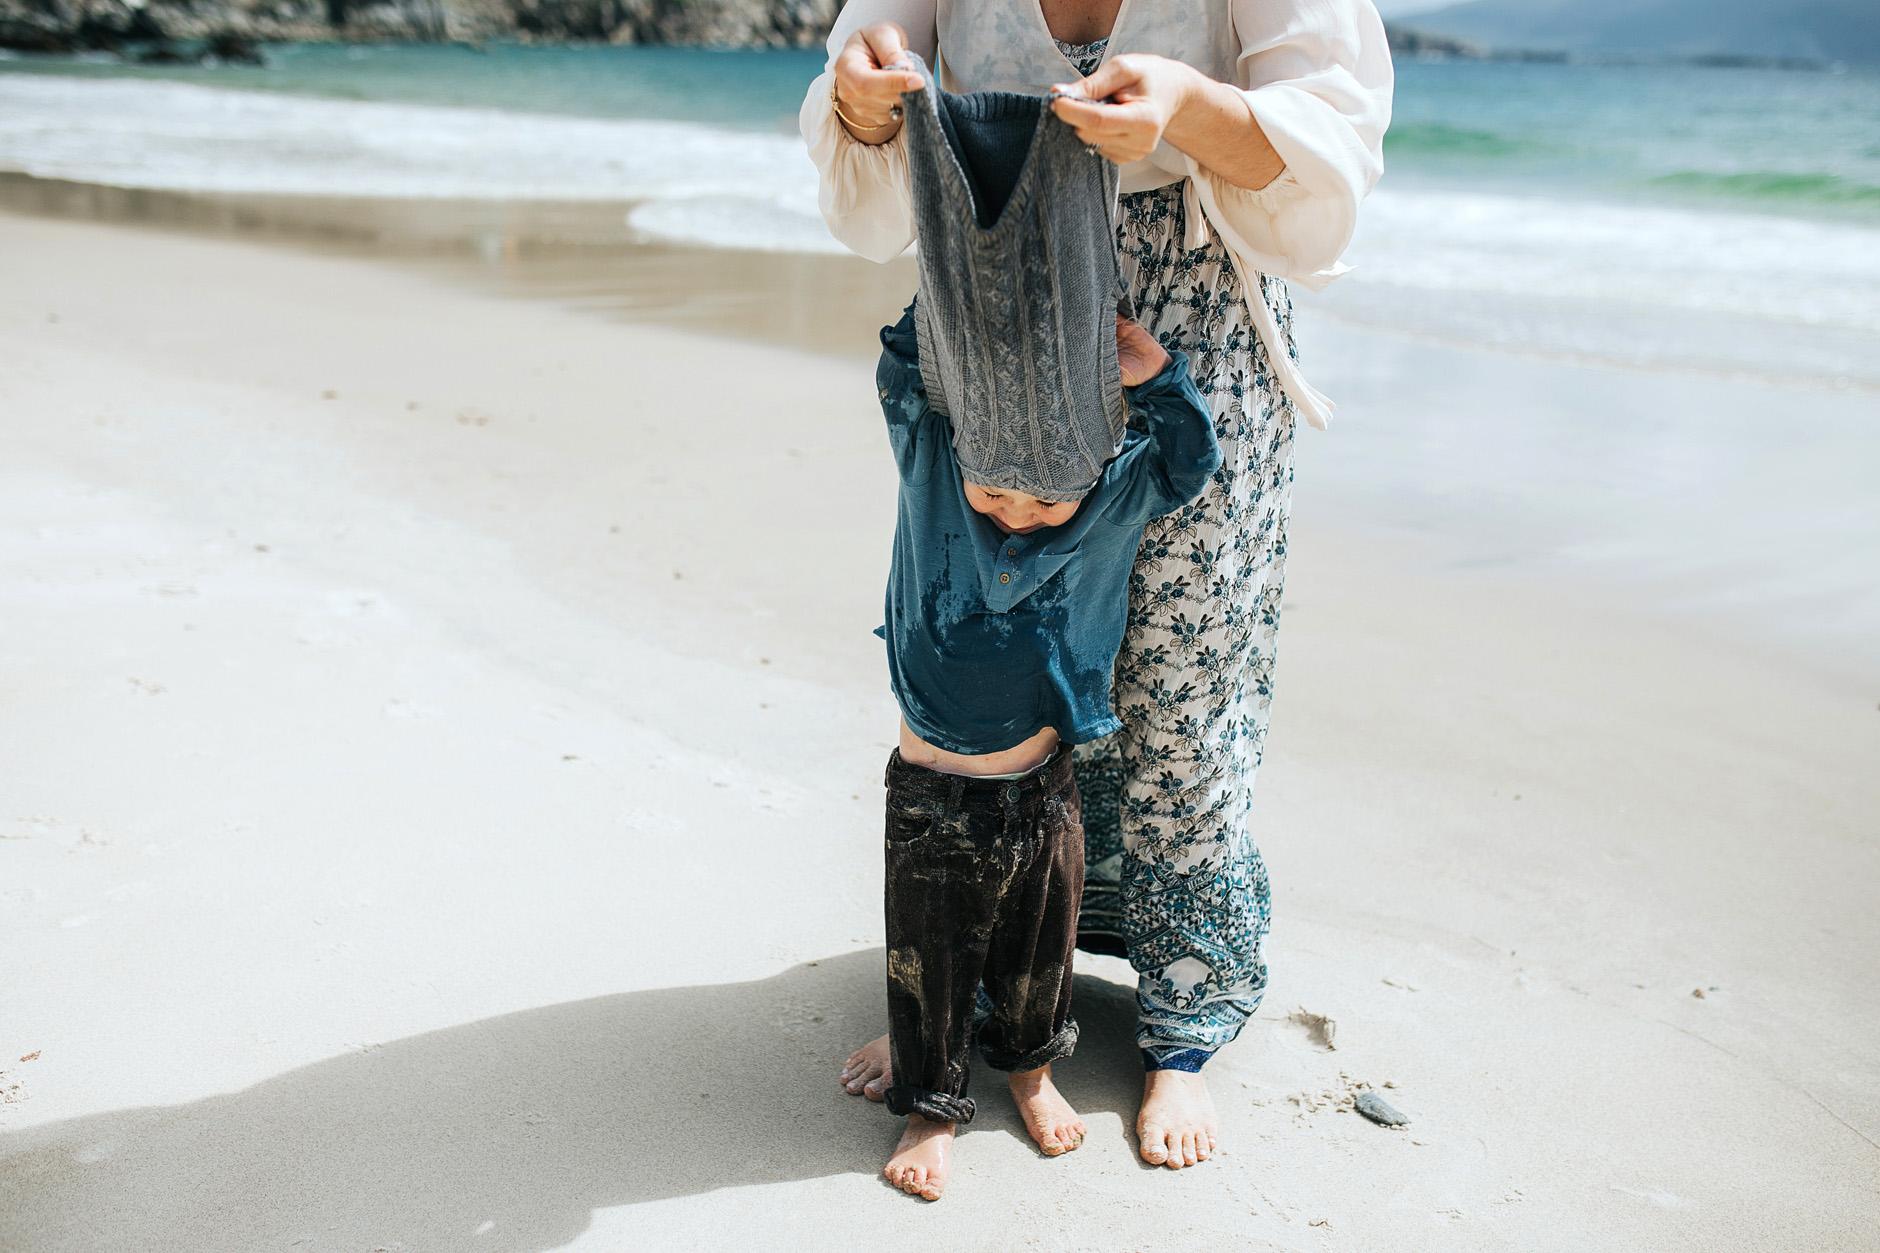 stunning-beach-family-vacation-photoshoot-achill-island-ireland-0017.jpg